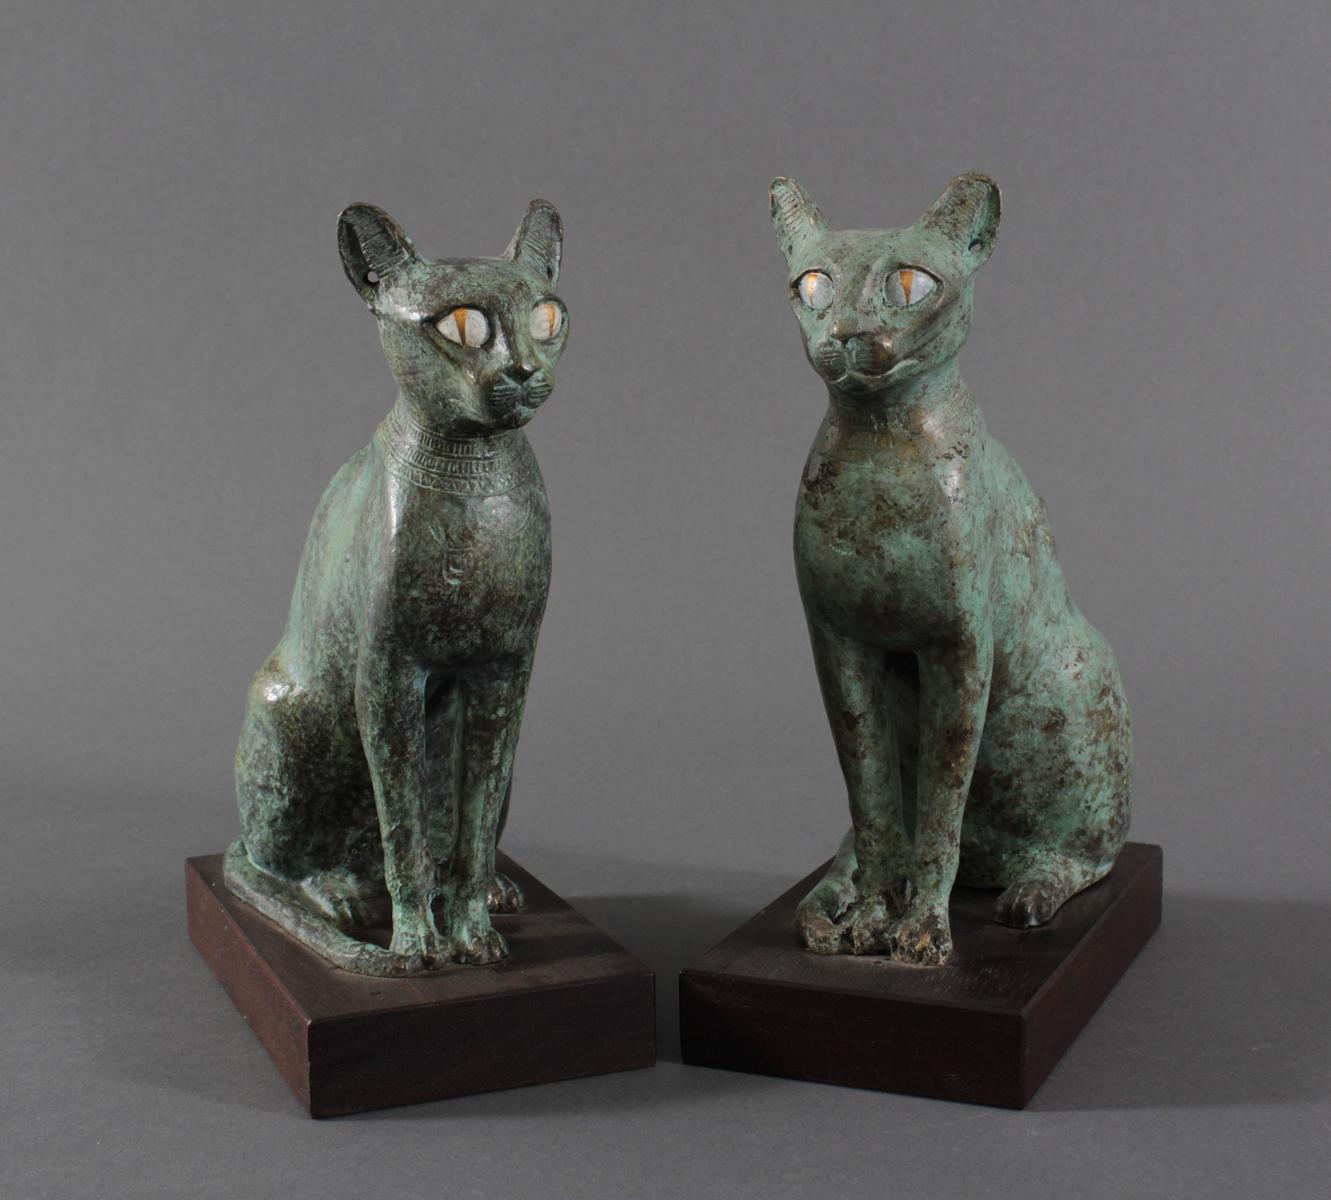 Paar Katzenfiguren aus Bronze,der Göttin Bastet Lieblingstier, Votivfiguren